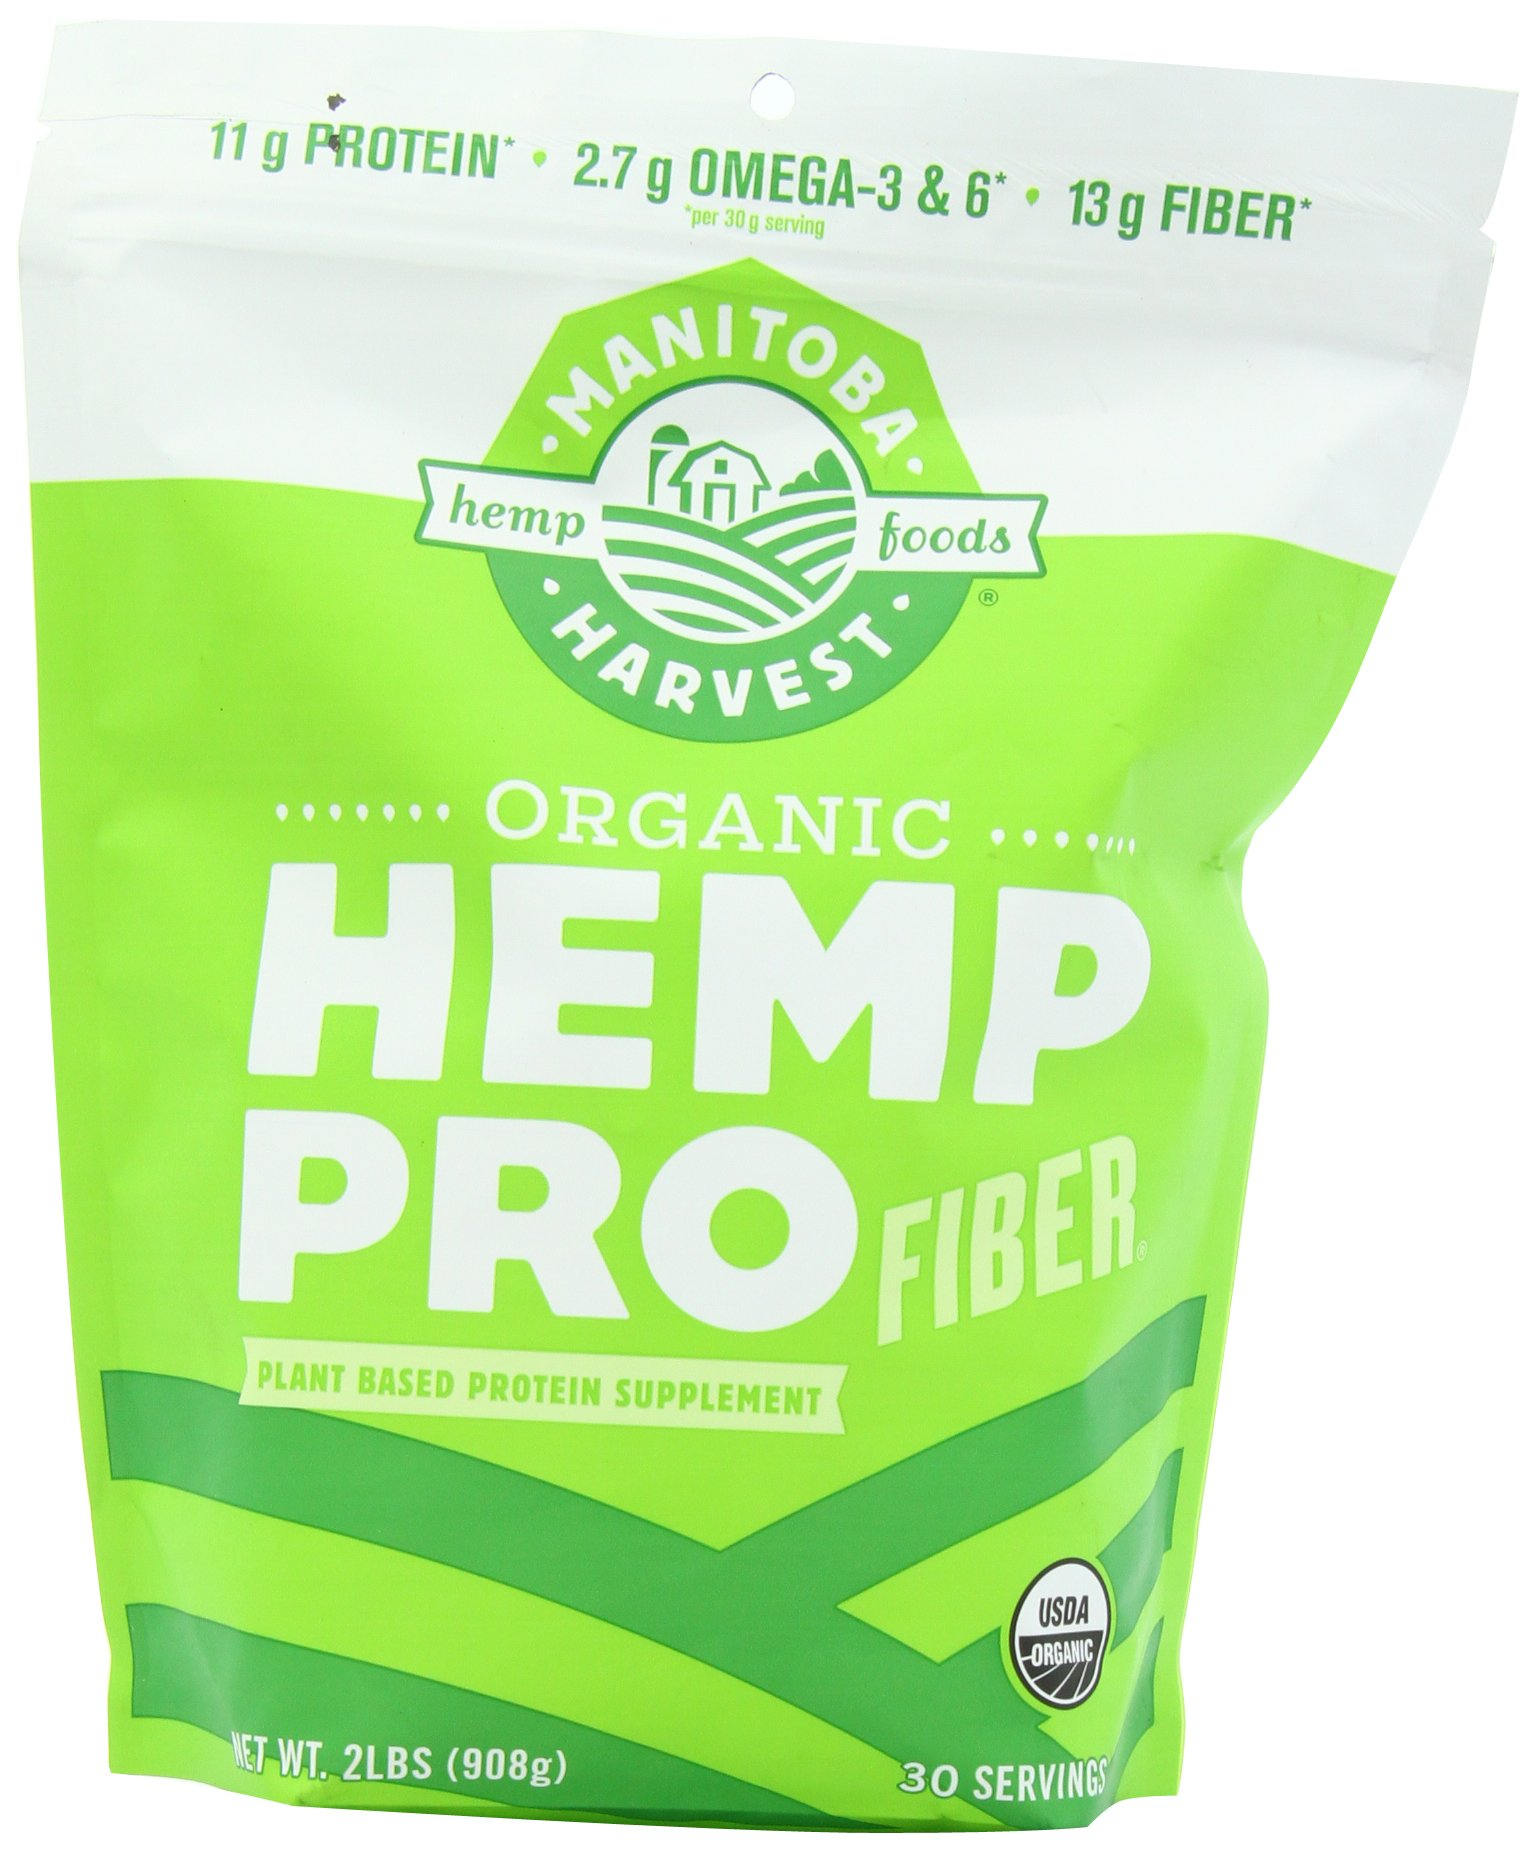 Manitoba Harvest Organic Hemp Pro Fiber Protein Powder, 32oz; with 13g Fiber & 11g Protein per serving, Preservative-Free